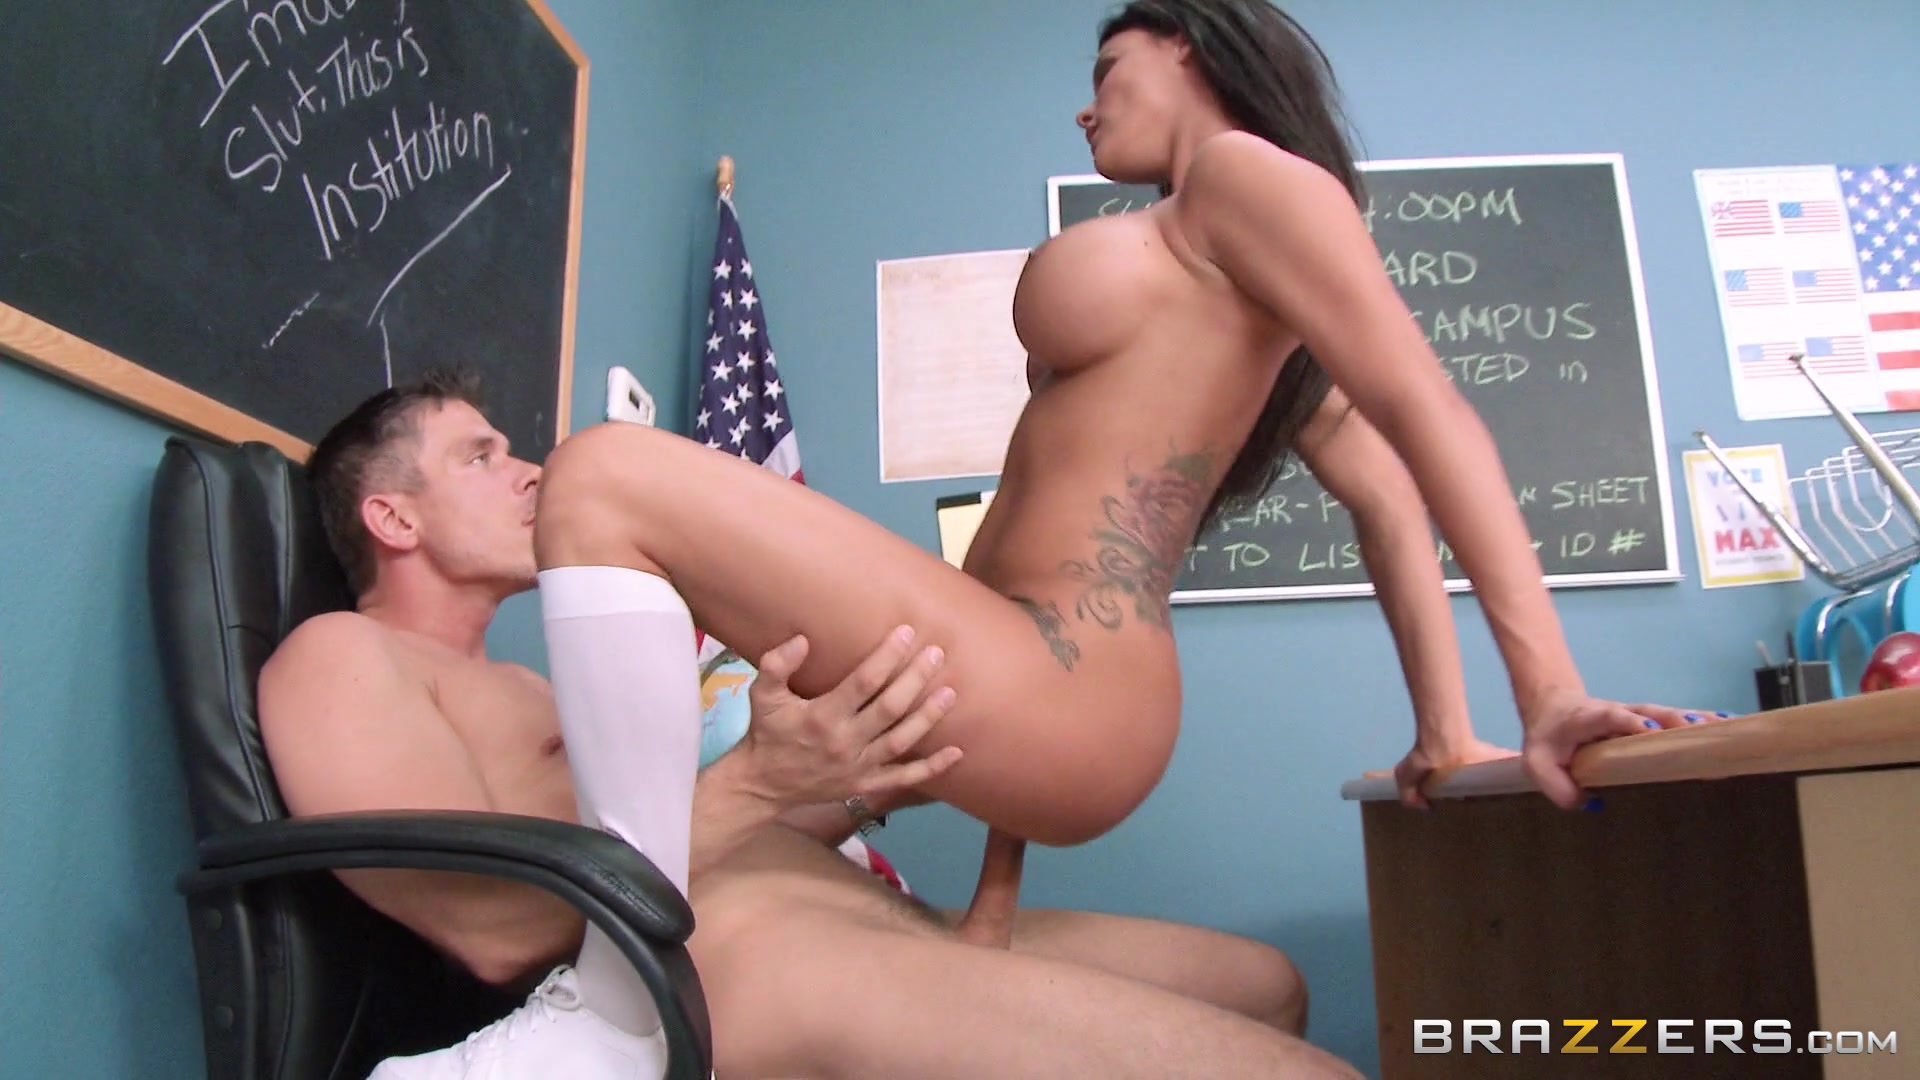 Brazzer video download free